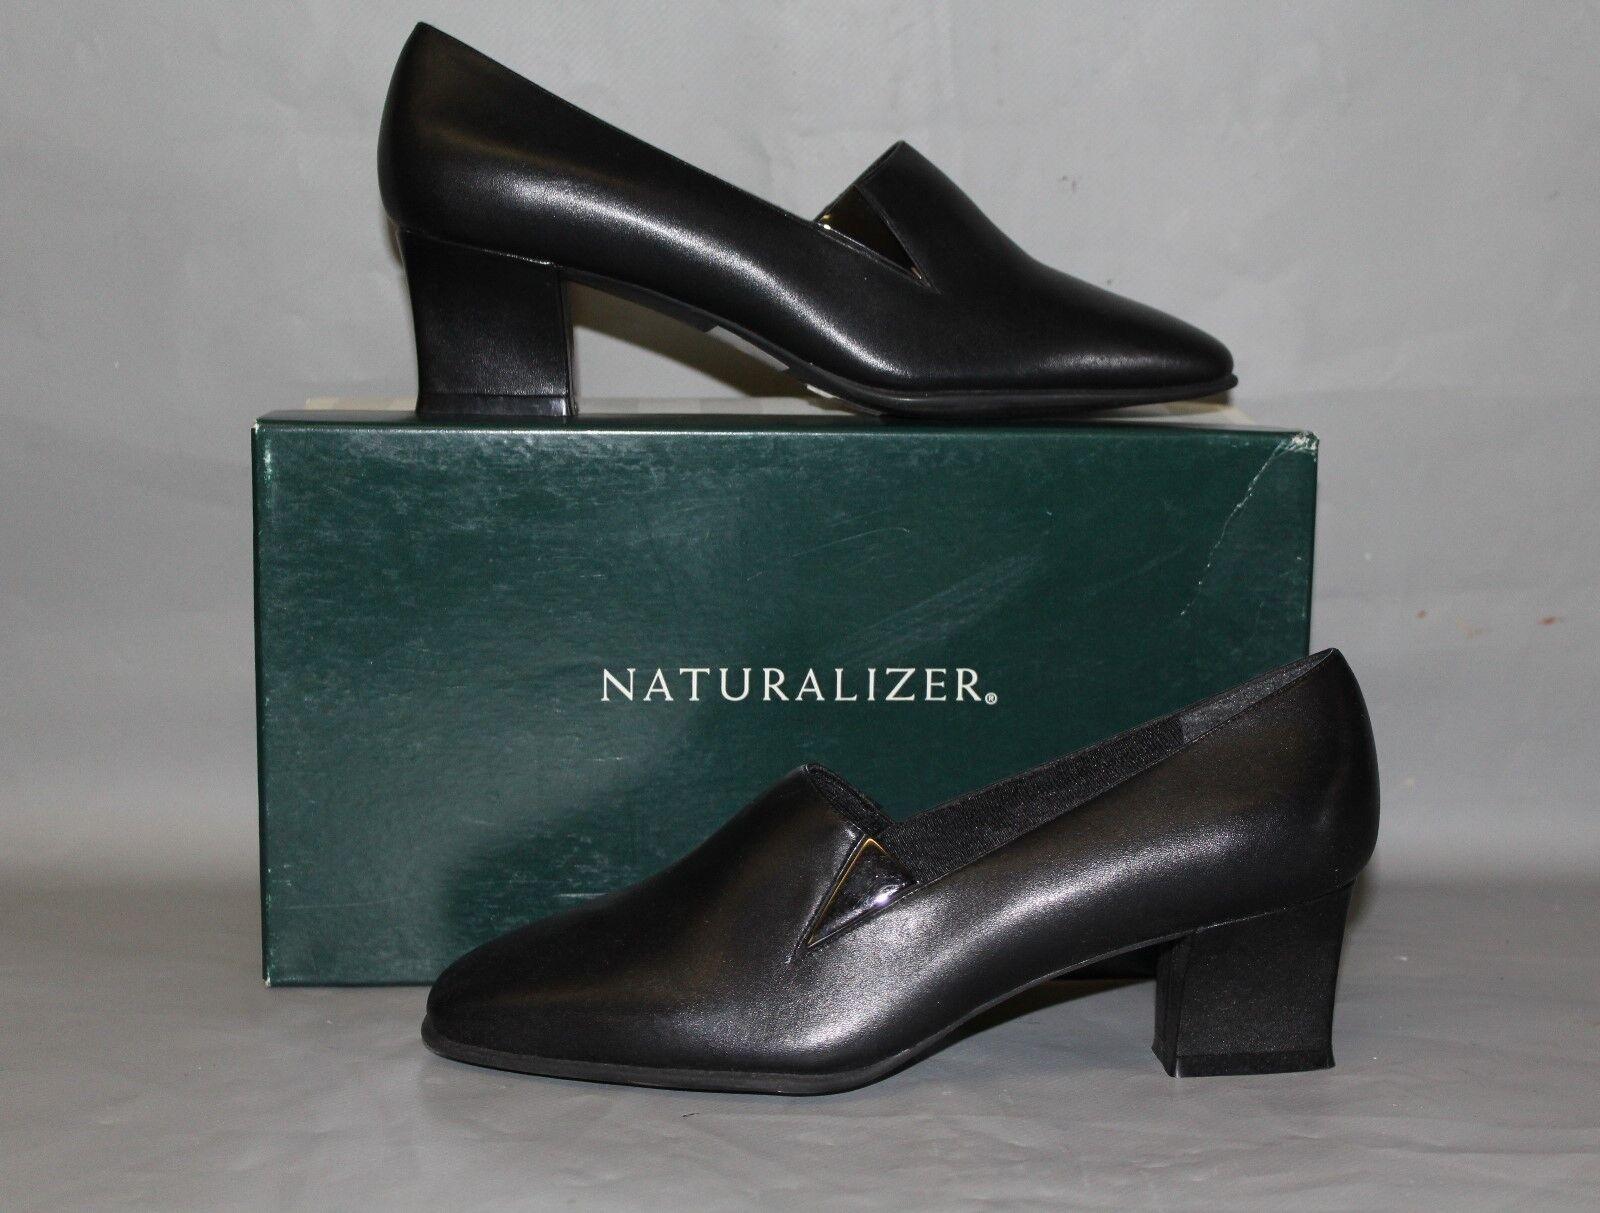 NEW Naturalizer Jodi, US Size 7.5 Medium Black Leather Dress Shoe / Pump